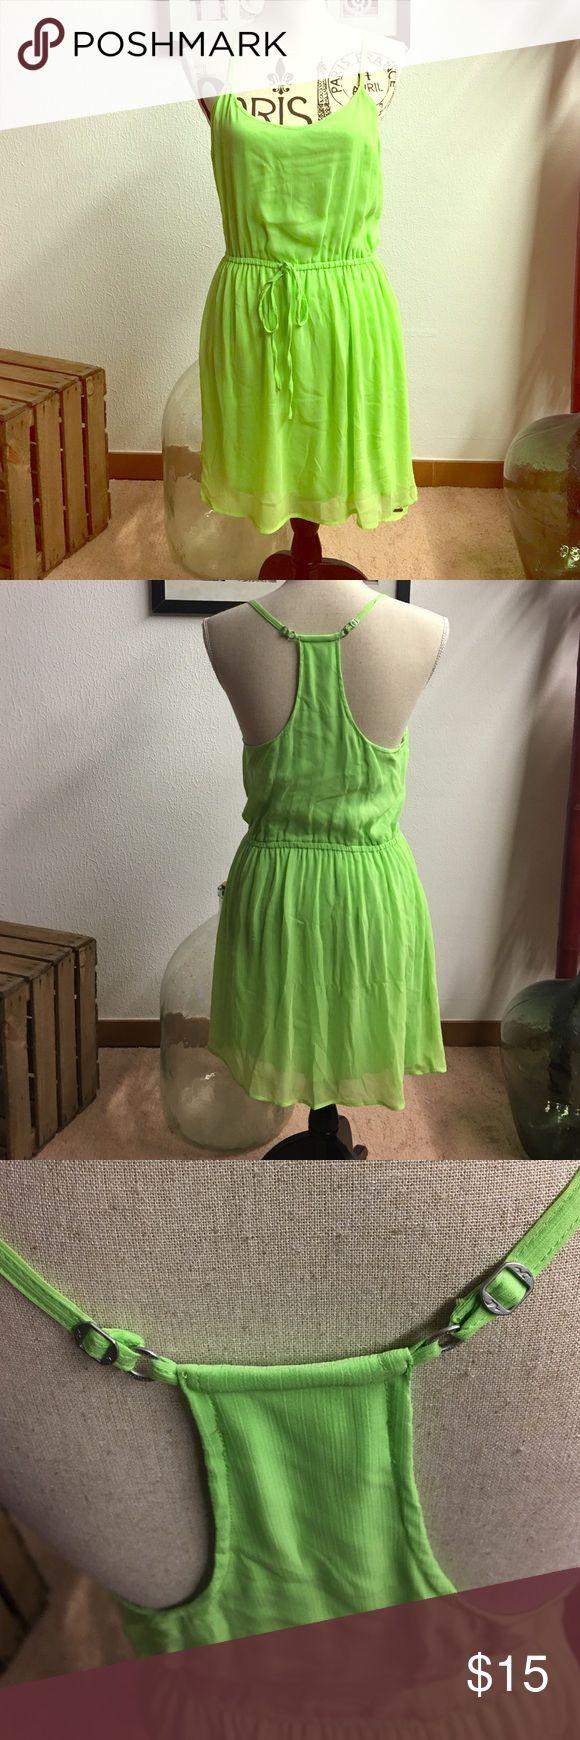 Lime green hollister dress Lime green elastic tie waist, razorback 💯 % polyester, lining 100% cotton Hollister Dresses Midi